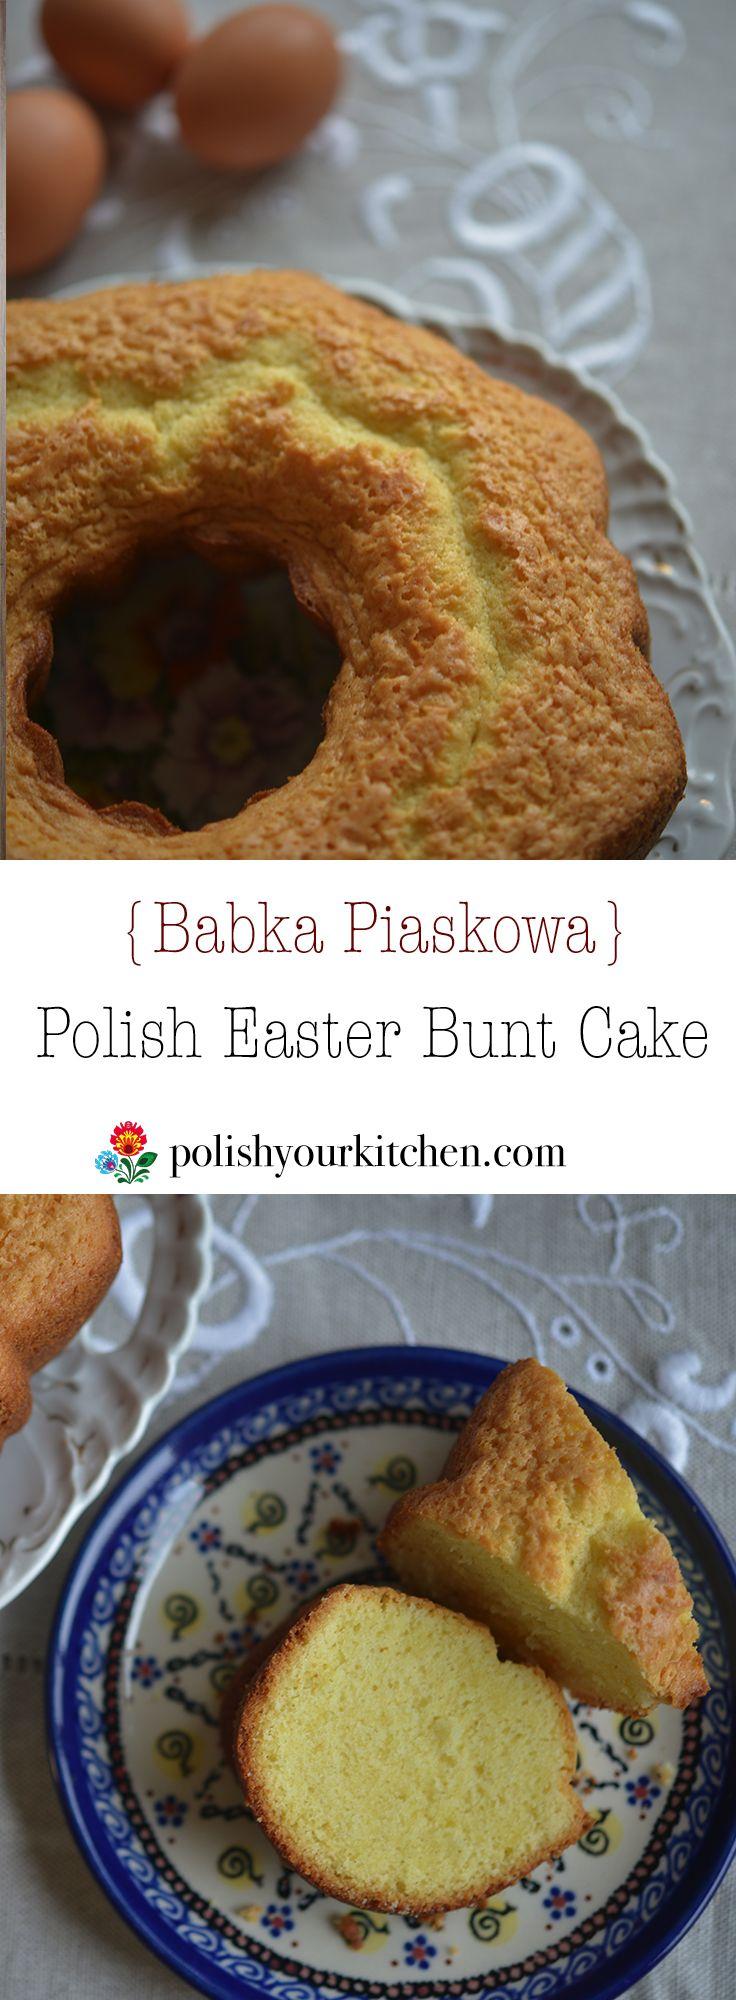 Simple recipe for favorite Polish dessert: Babka. Sweet, light and soft cake, slightly lemony often prepared for Polish Easter or Christmas. Recipe by Anna @polishyourkitchen.